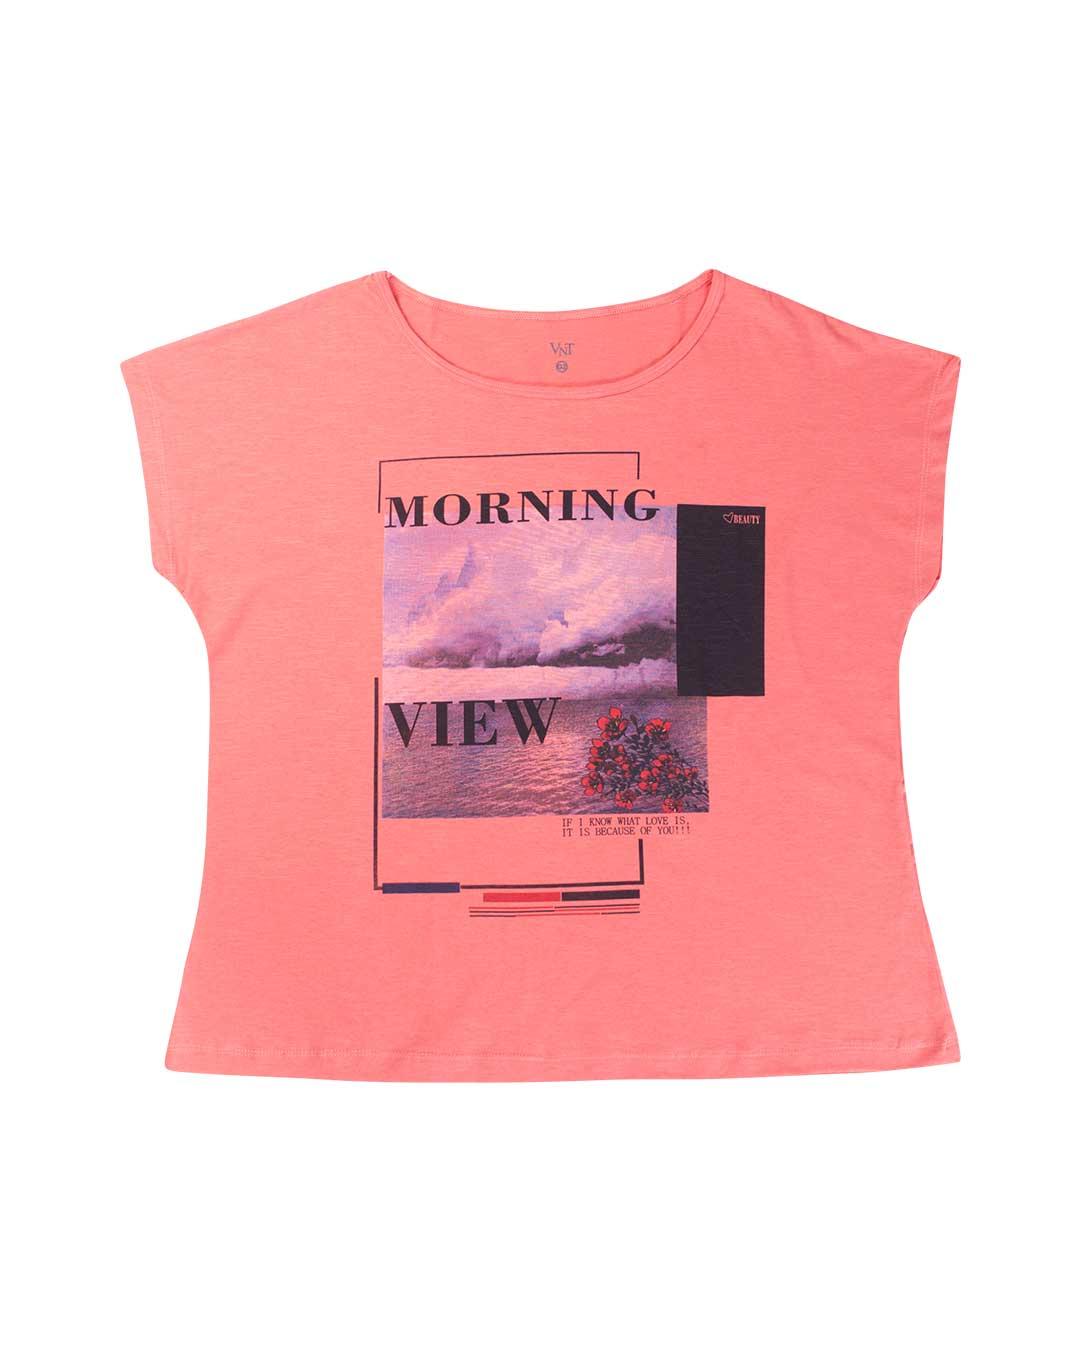 Blusa Adulta Plus Size Morning Salmão - VNT Confecções